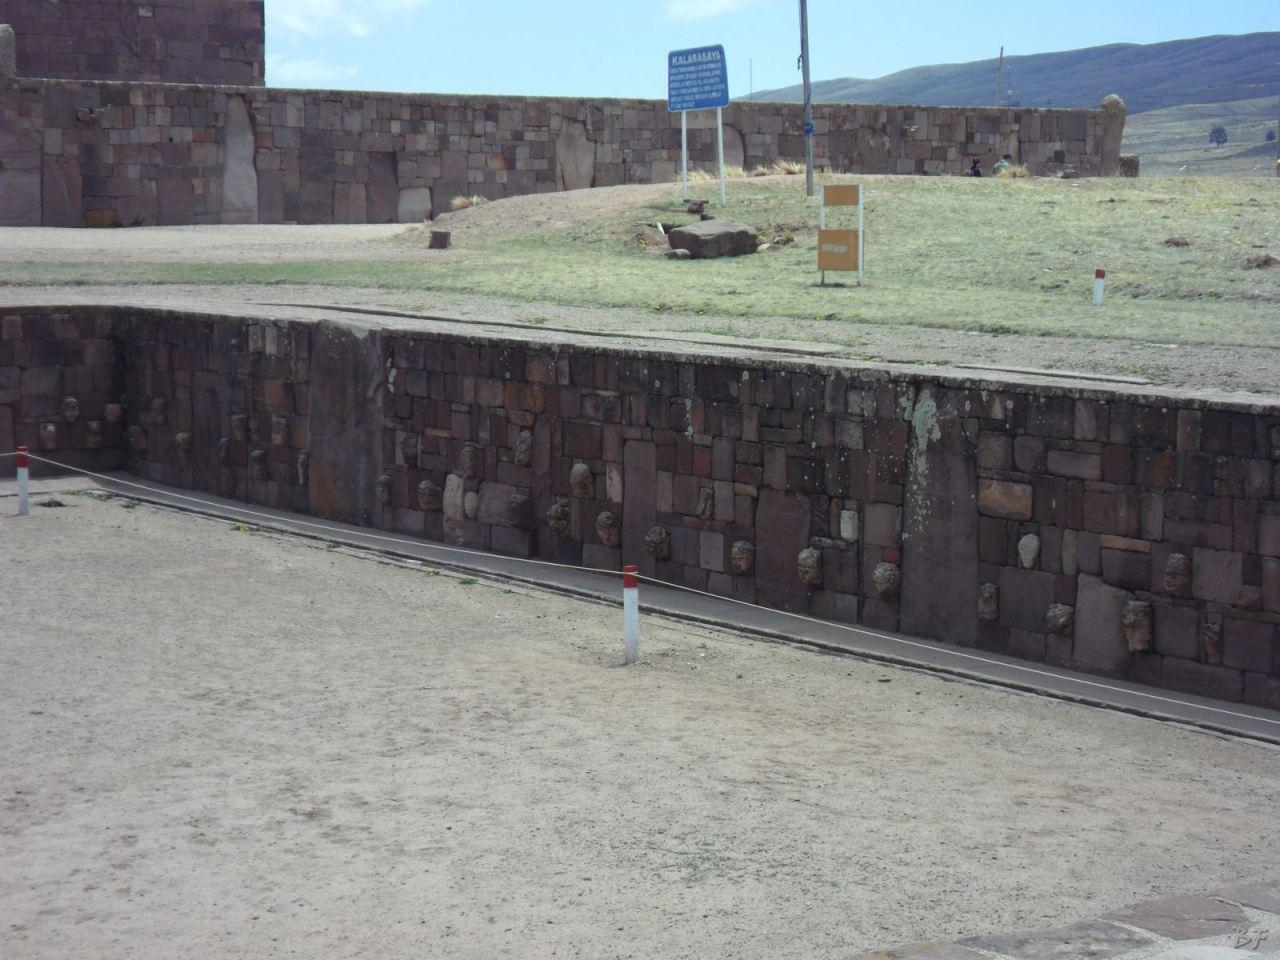 Sito-Megalitico-Piramide-Akapana-Kalasasaya-Menhir-Tiahuanaco-Bolivia-76